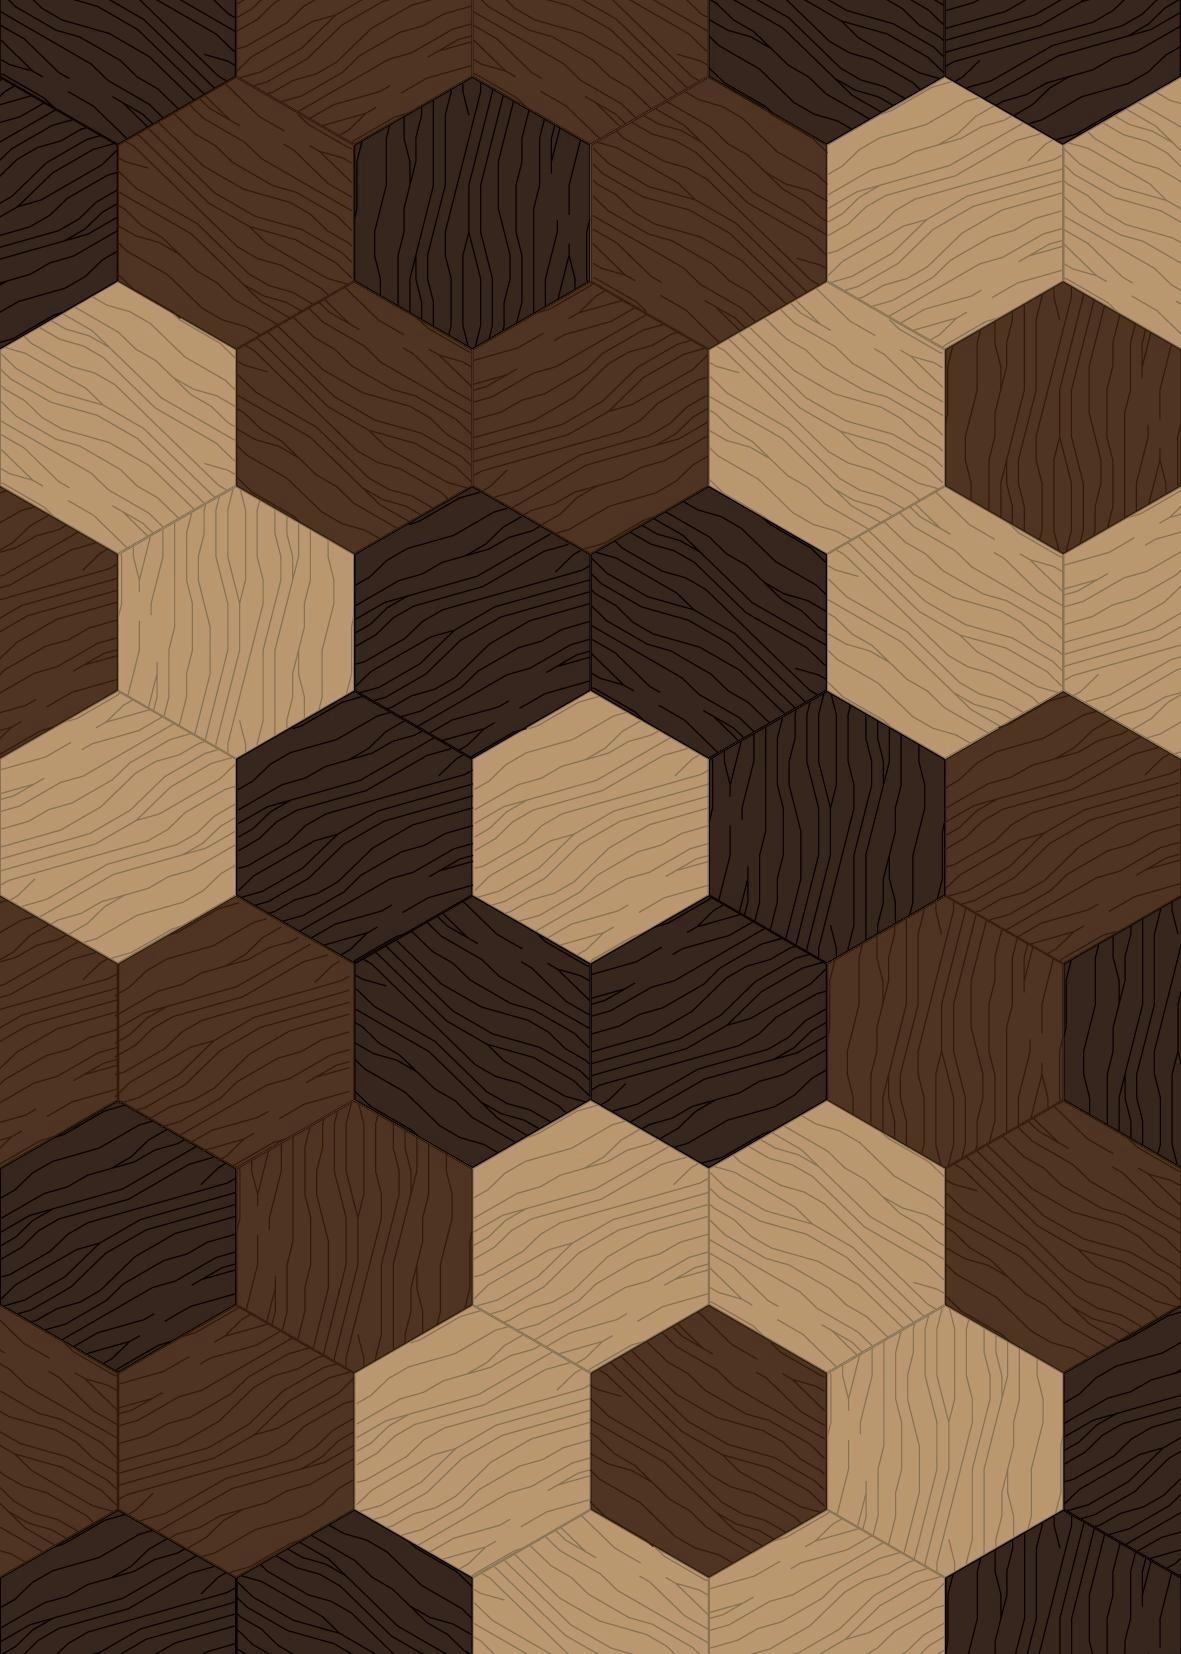 Faraday Carpet